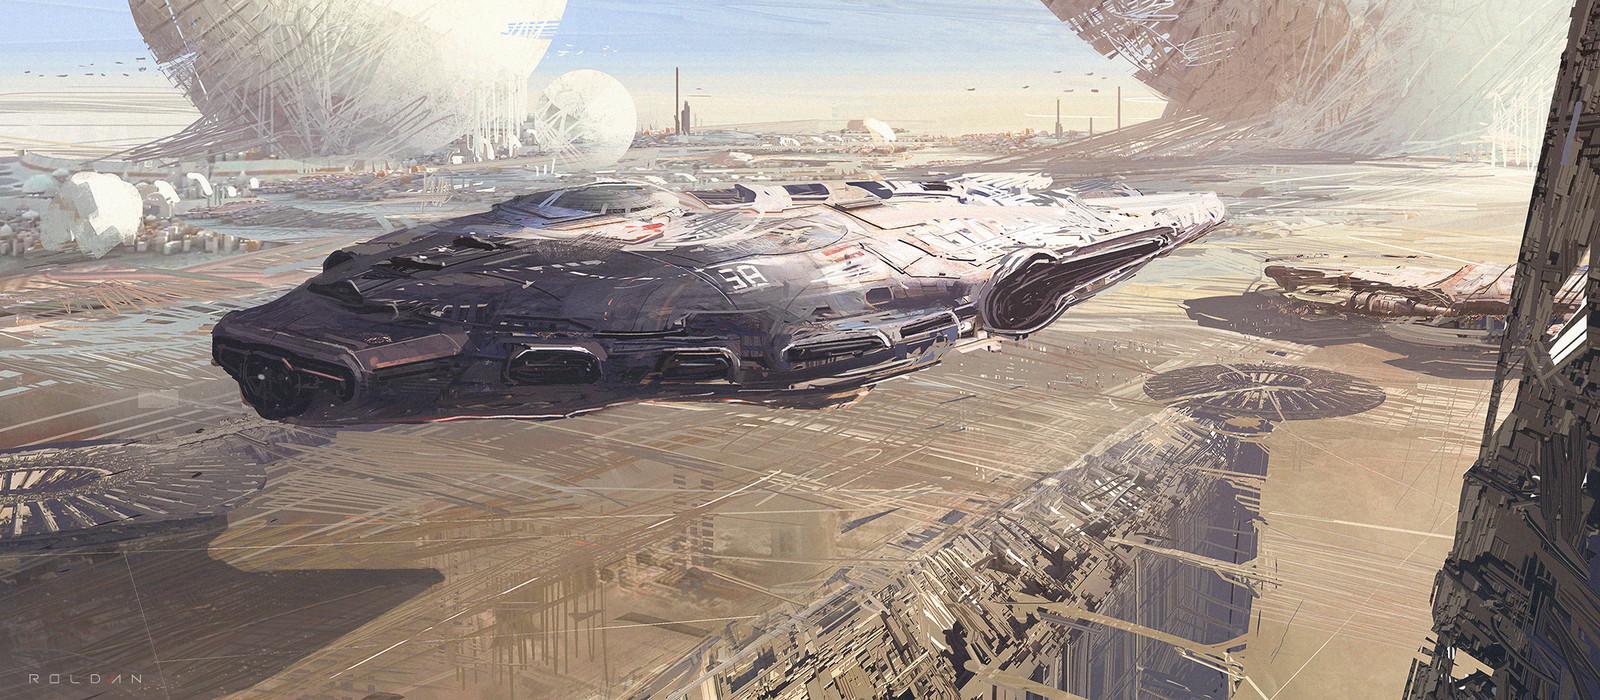 Starwars - Inspiration